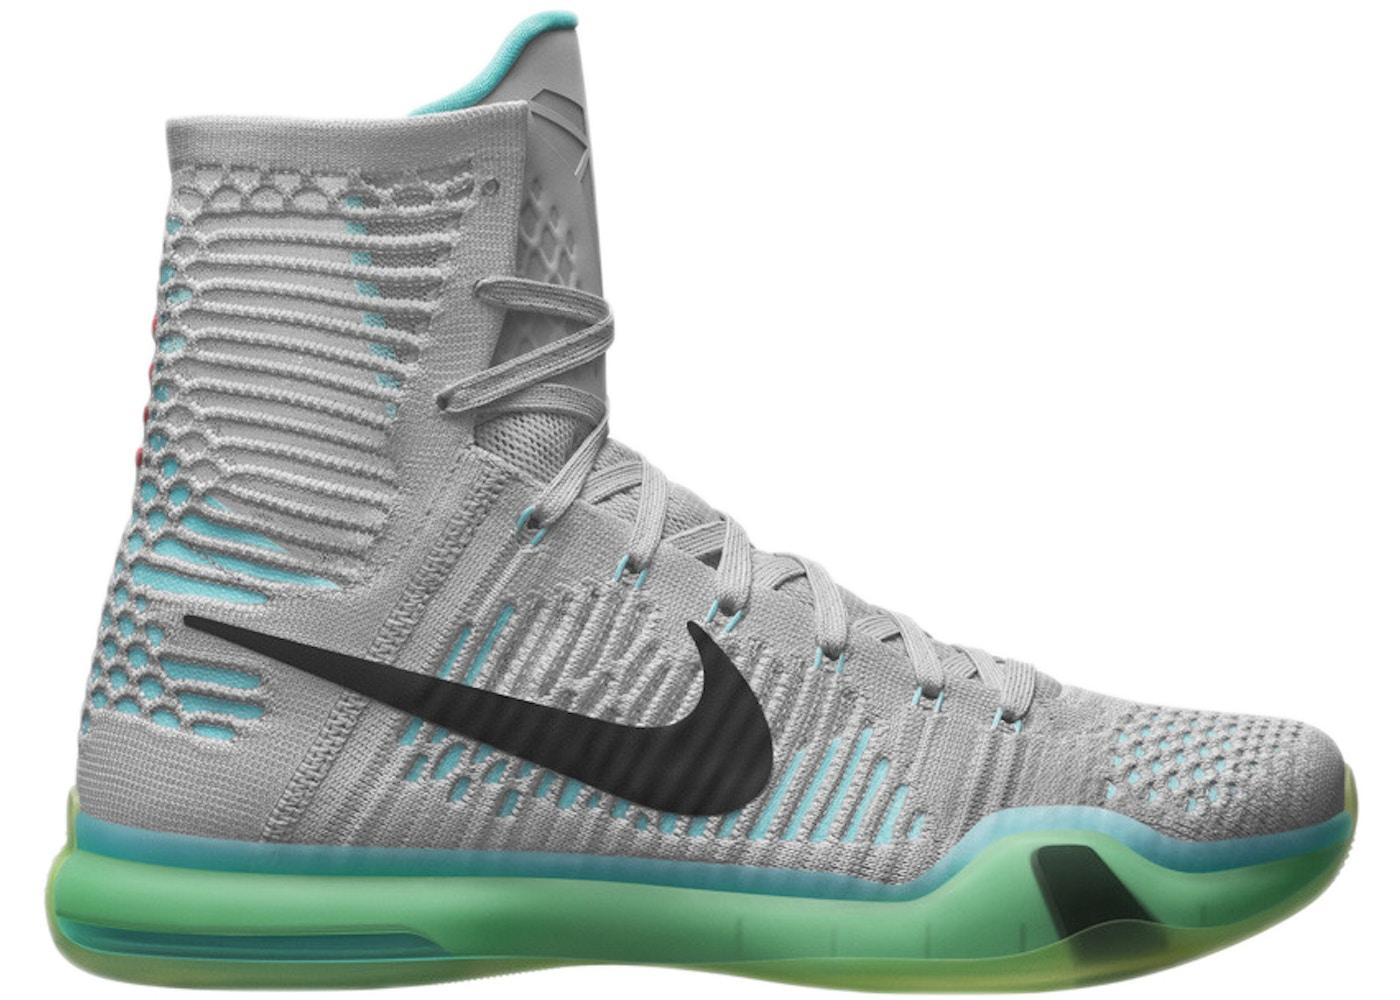 254ad0afb7d6 Nike Kobe 10 Shoes - Average Sale Price